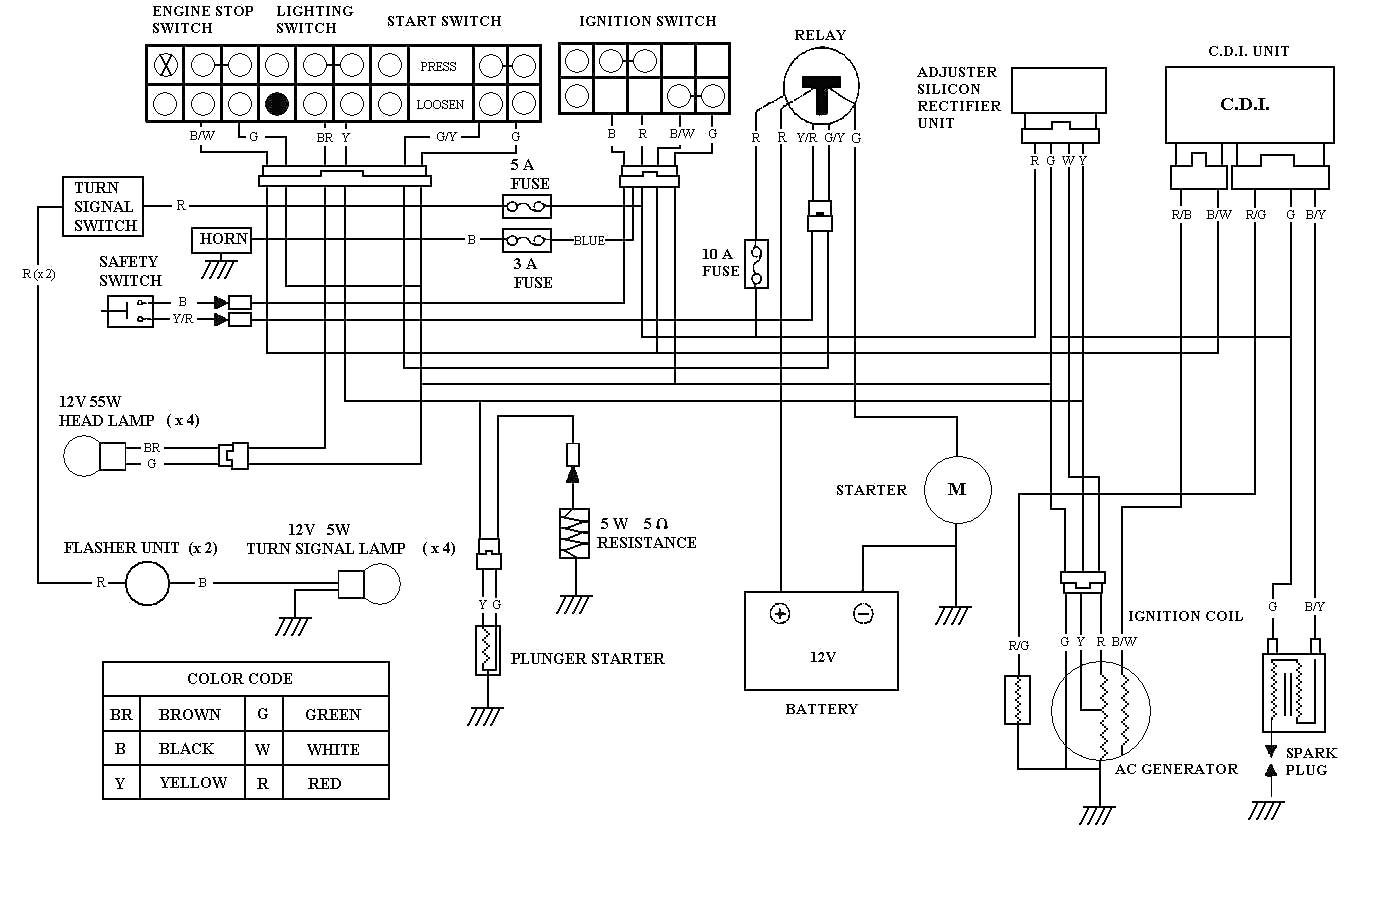 Kasea 50 Wiring Diagram | Wiring Diagrams on tomos wiring diagram, norton wiring diagram, motor trike wiring diagram, ossa wiring diagram, kymco wiring diagram, garelli wiring diagram, suzuki wiring diagram, dinli wiring diagram, vespa wiring diagram, kazuma wiring diagram, smc wiring diagram, husaberg wiring diagram, kawasaki wiring diagram, ural wiring diagram, motofino wiring diagram, yamaha wiring diagram, alpha sports wiring diagram, lifan wiring diagram, royal ryder wiring diagram, phantom wiring diagram,